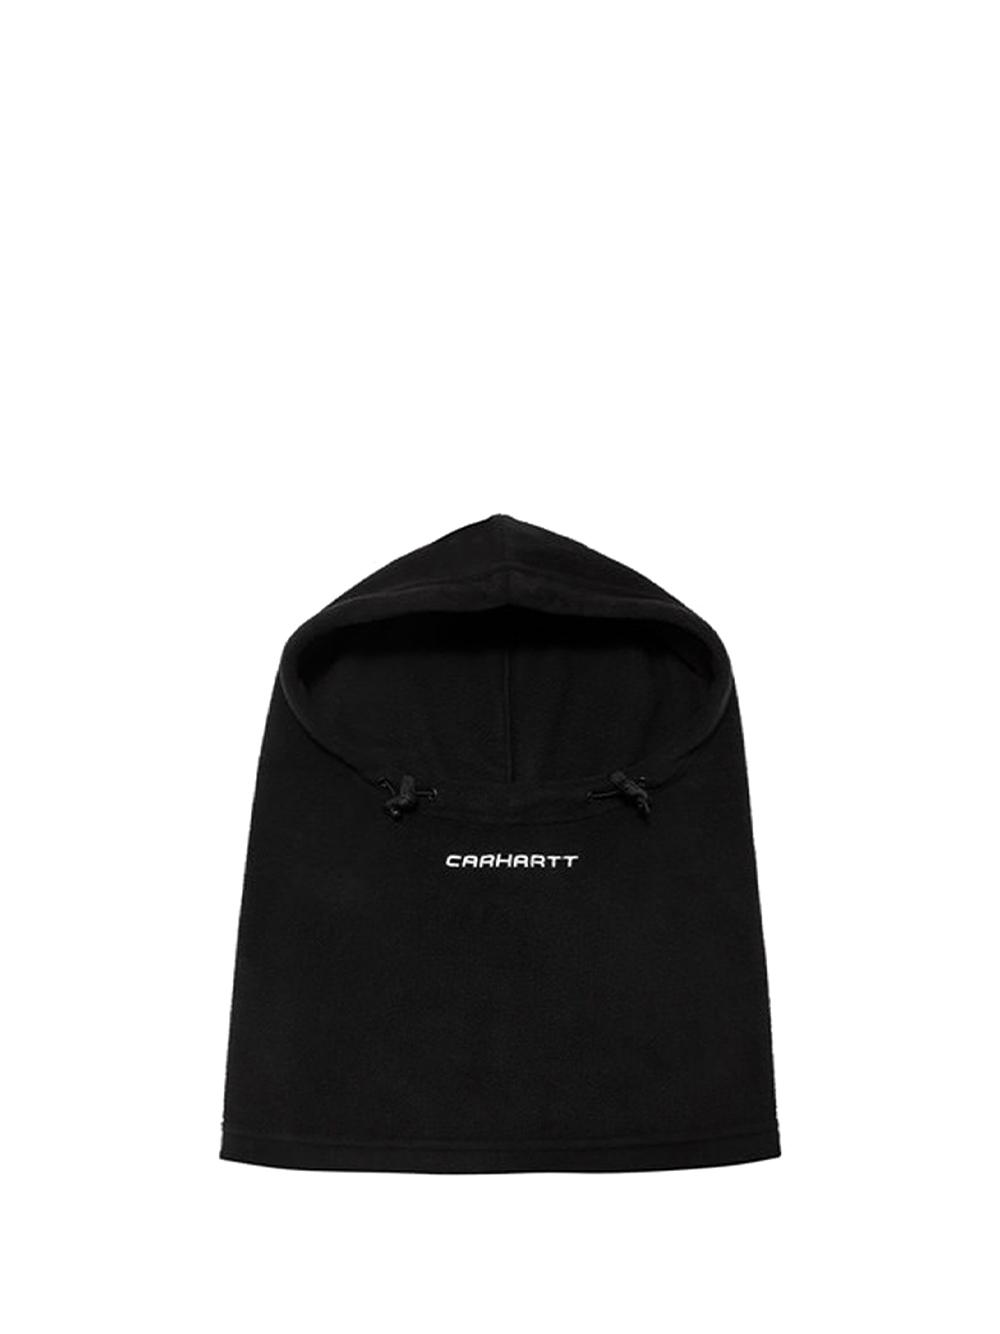 Carhartt Wip beaomount mask man black CARHARTT WIP | Mixed | I028104.0689.90